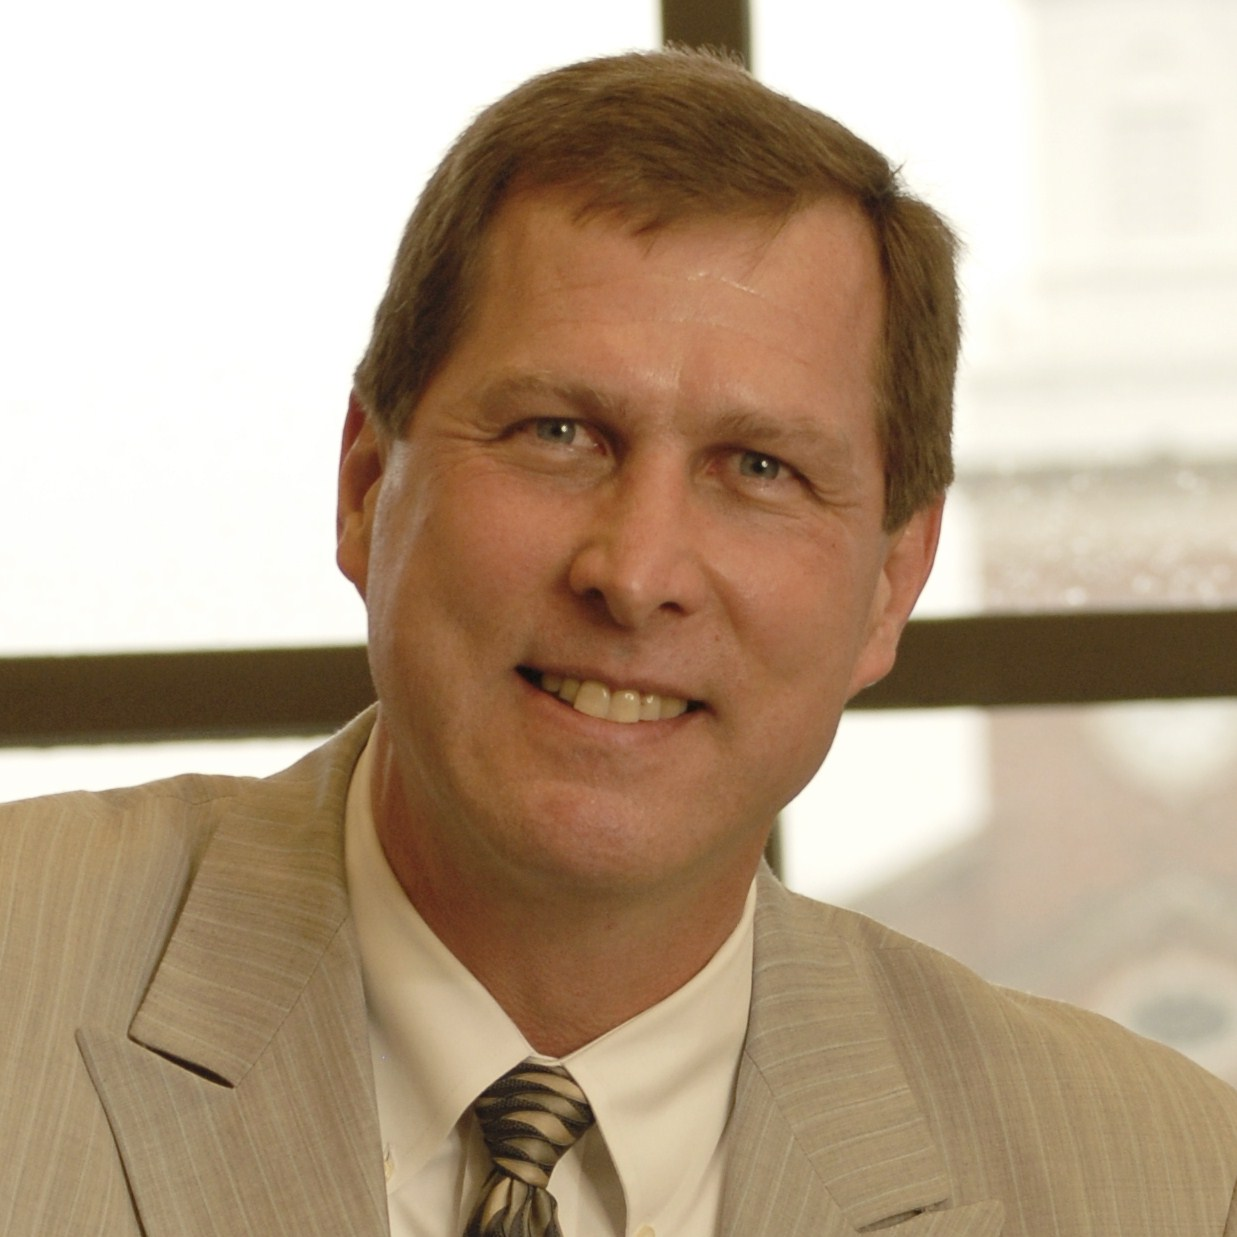 Steve Ritter, LCSW